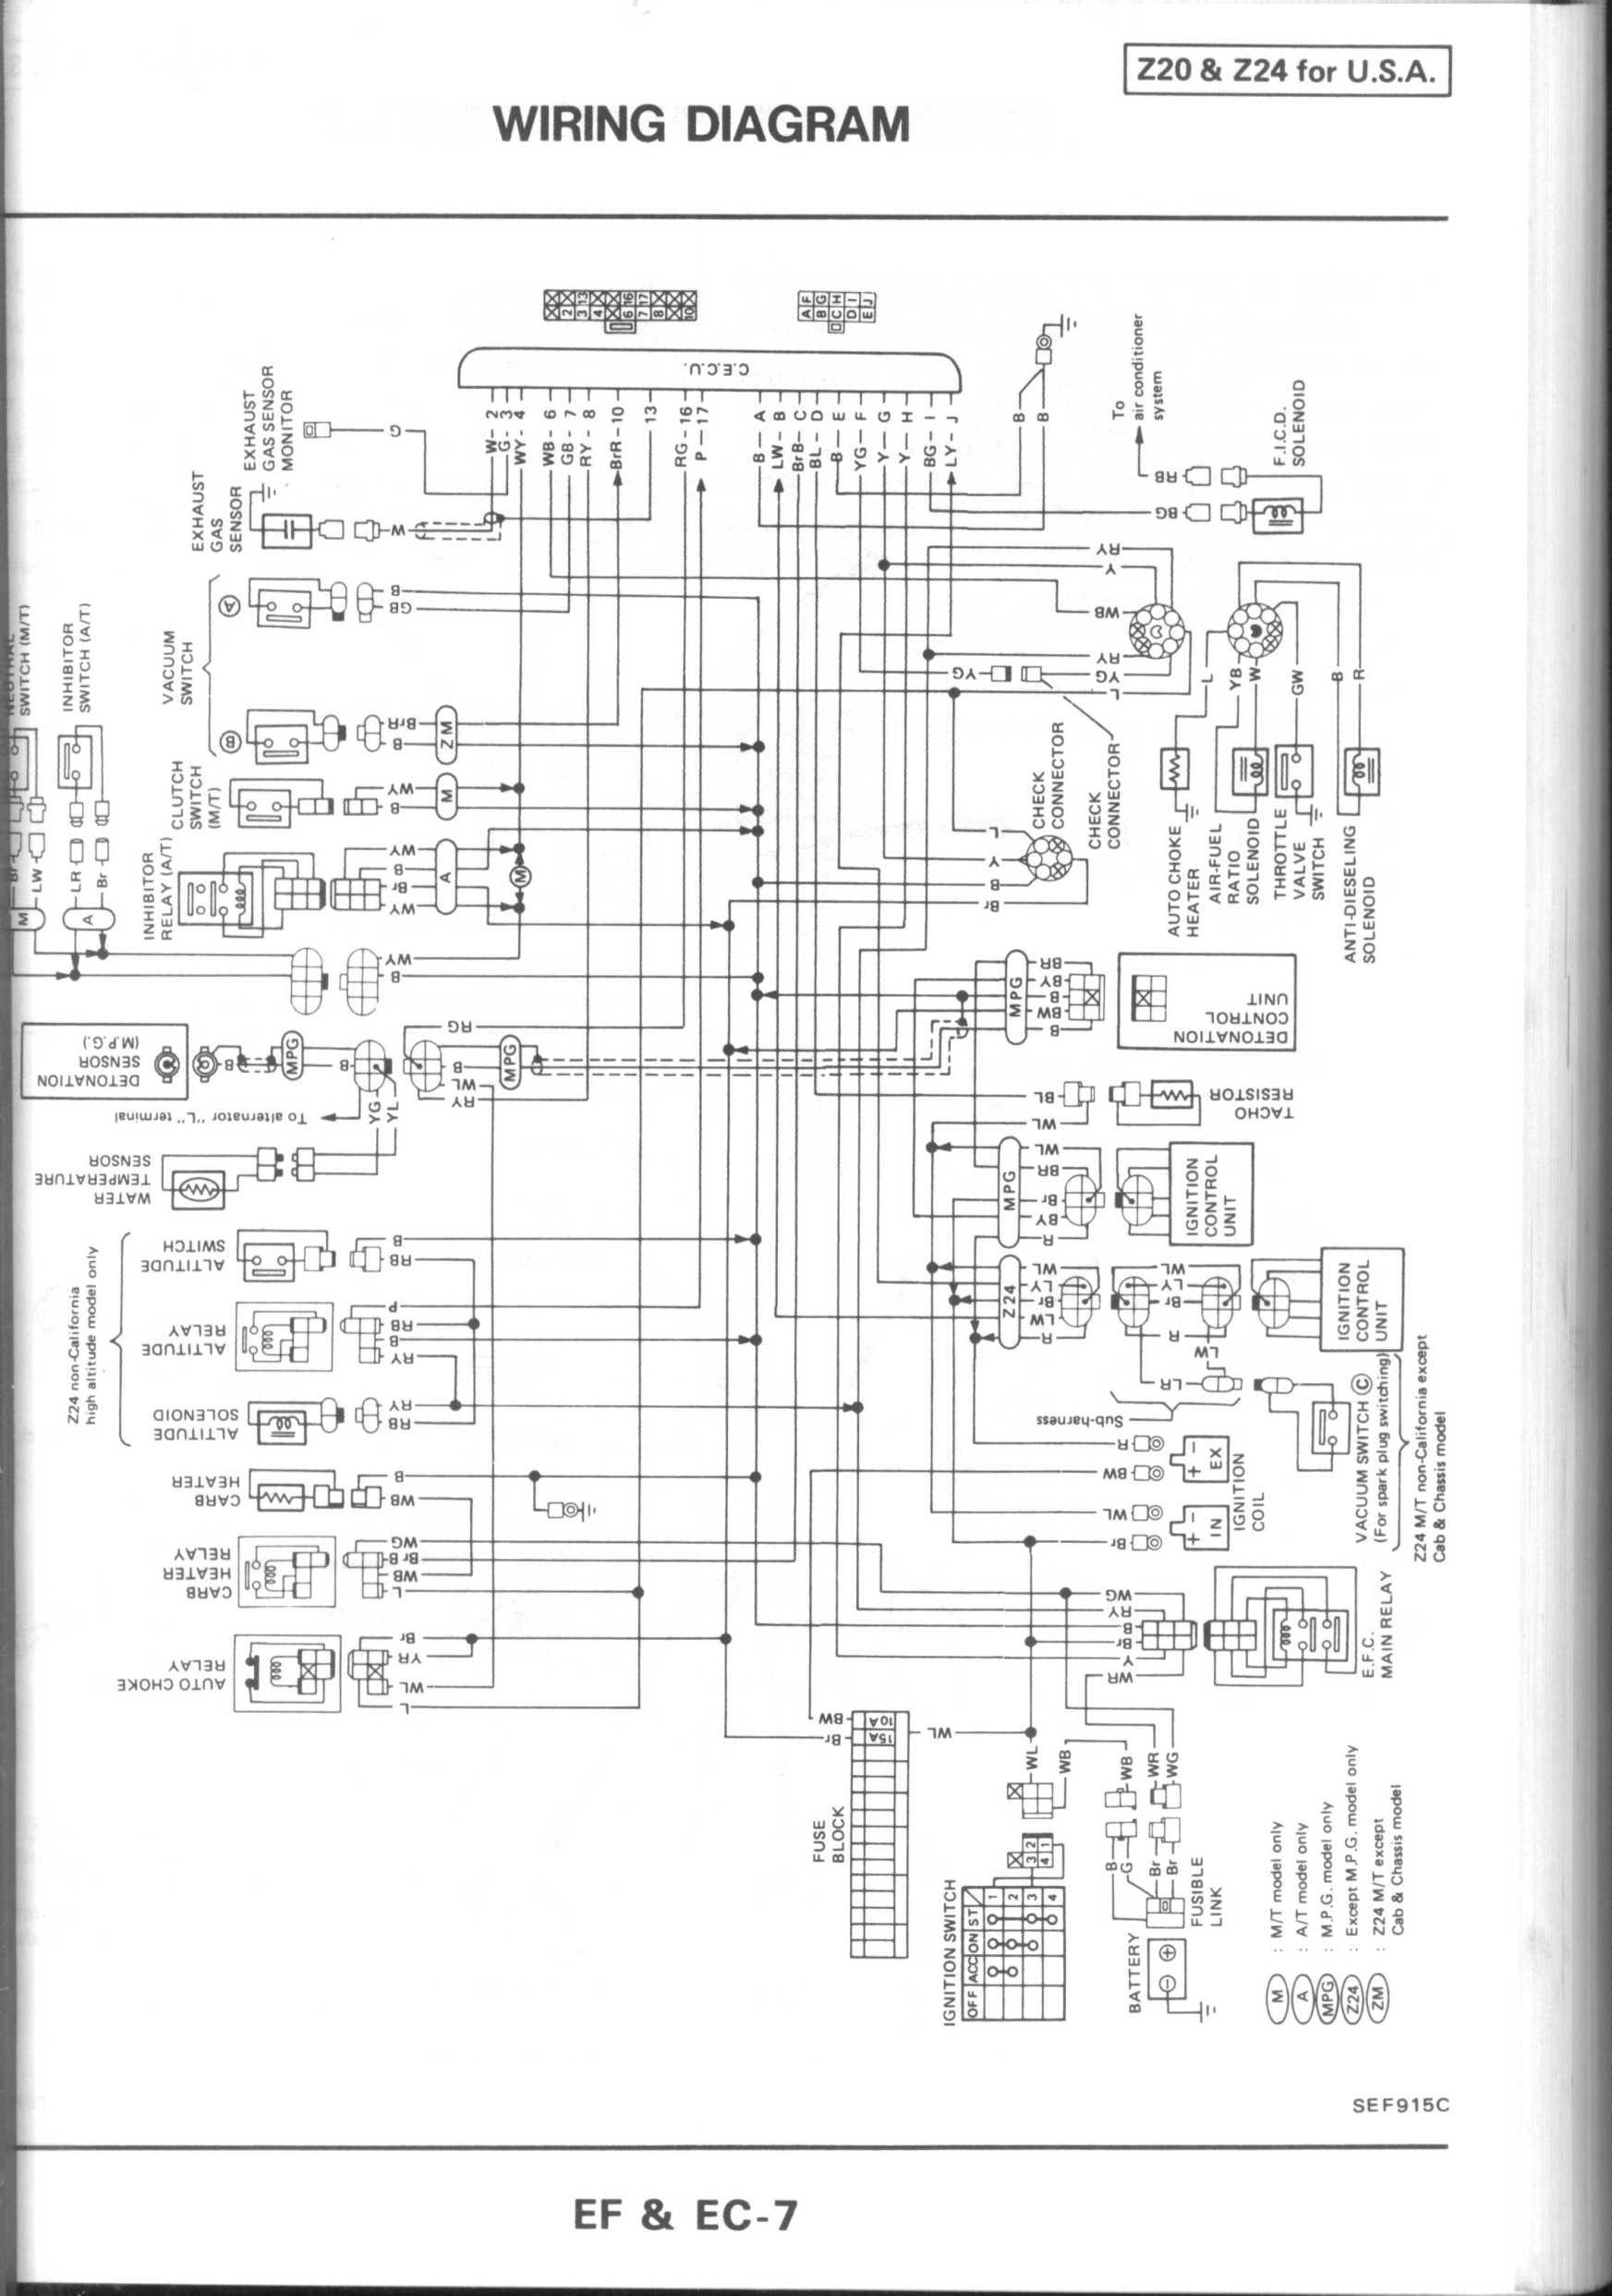 nissan navara d22 stereo wiring harness nissan wiring diagram nissan d22 wiring auto wiring diagram database on nissan navara d22 stereo wiring harness